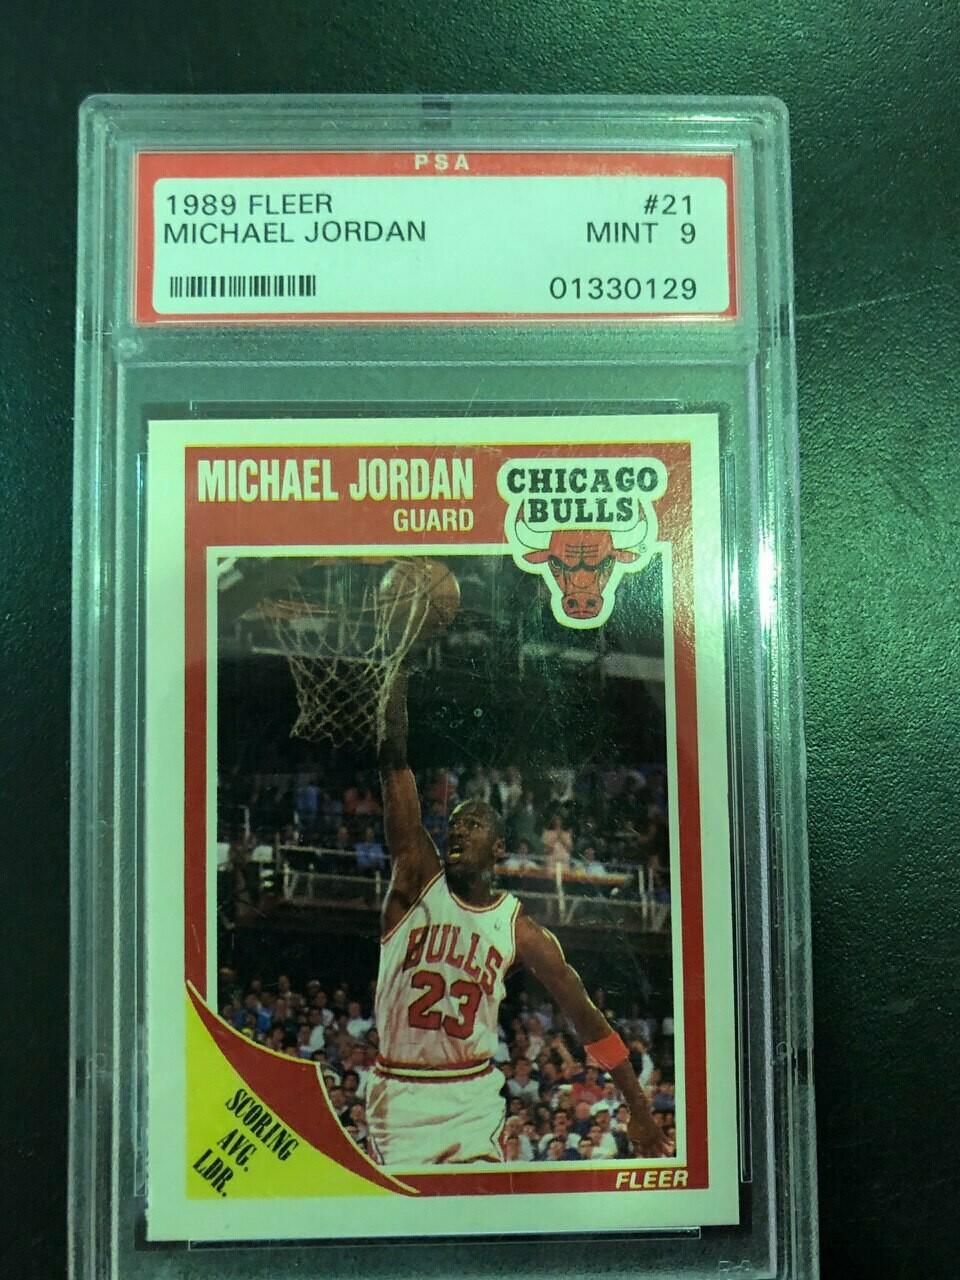 1989/90 Fleer Michael Jordan PSA graded 9, $30